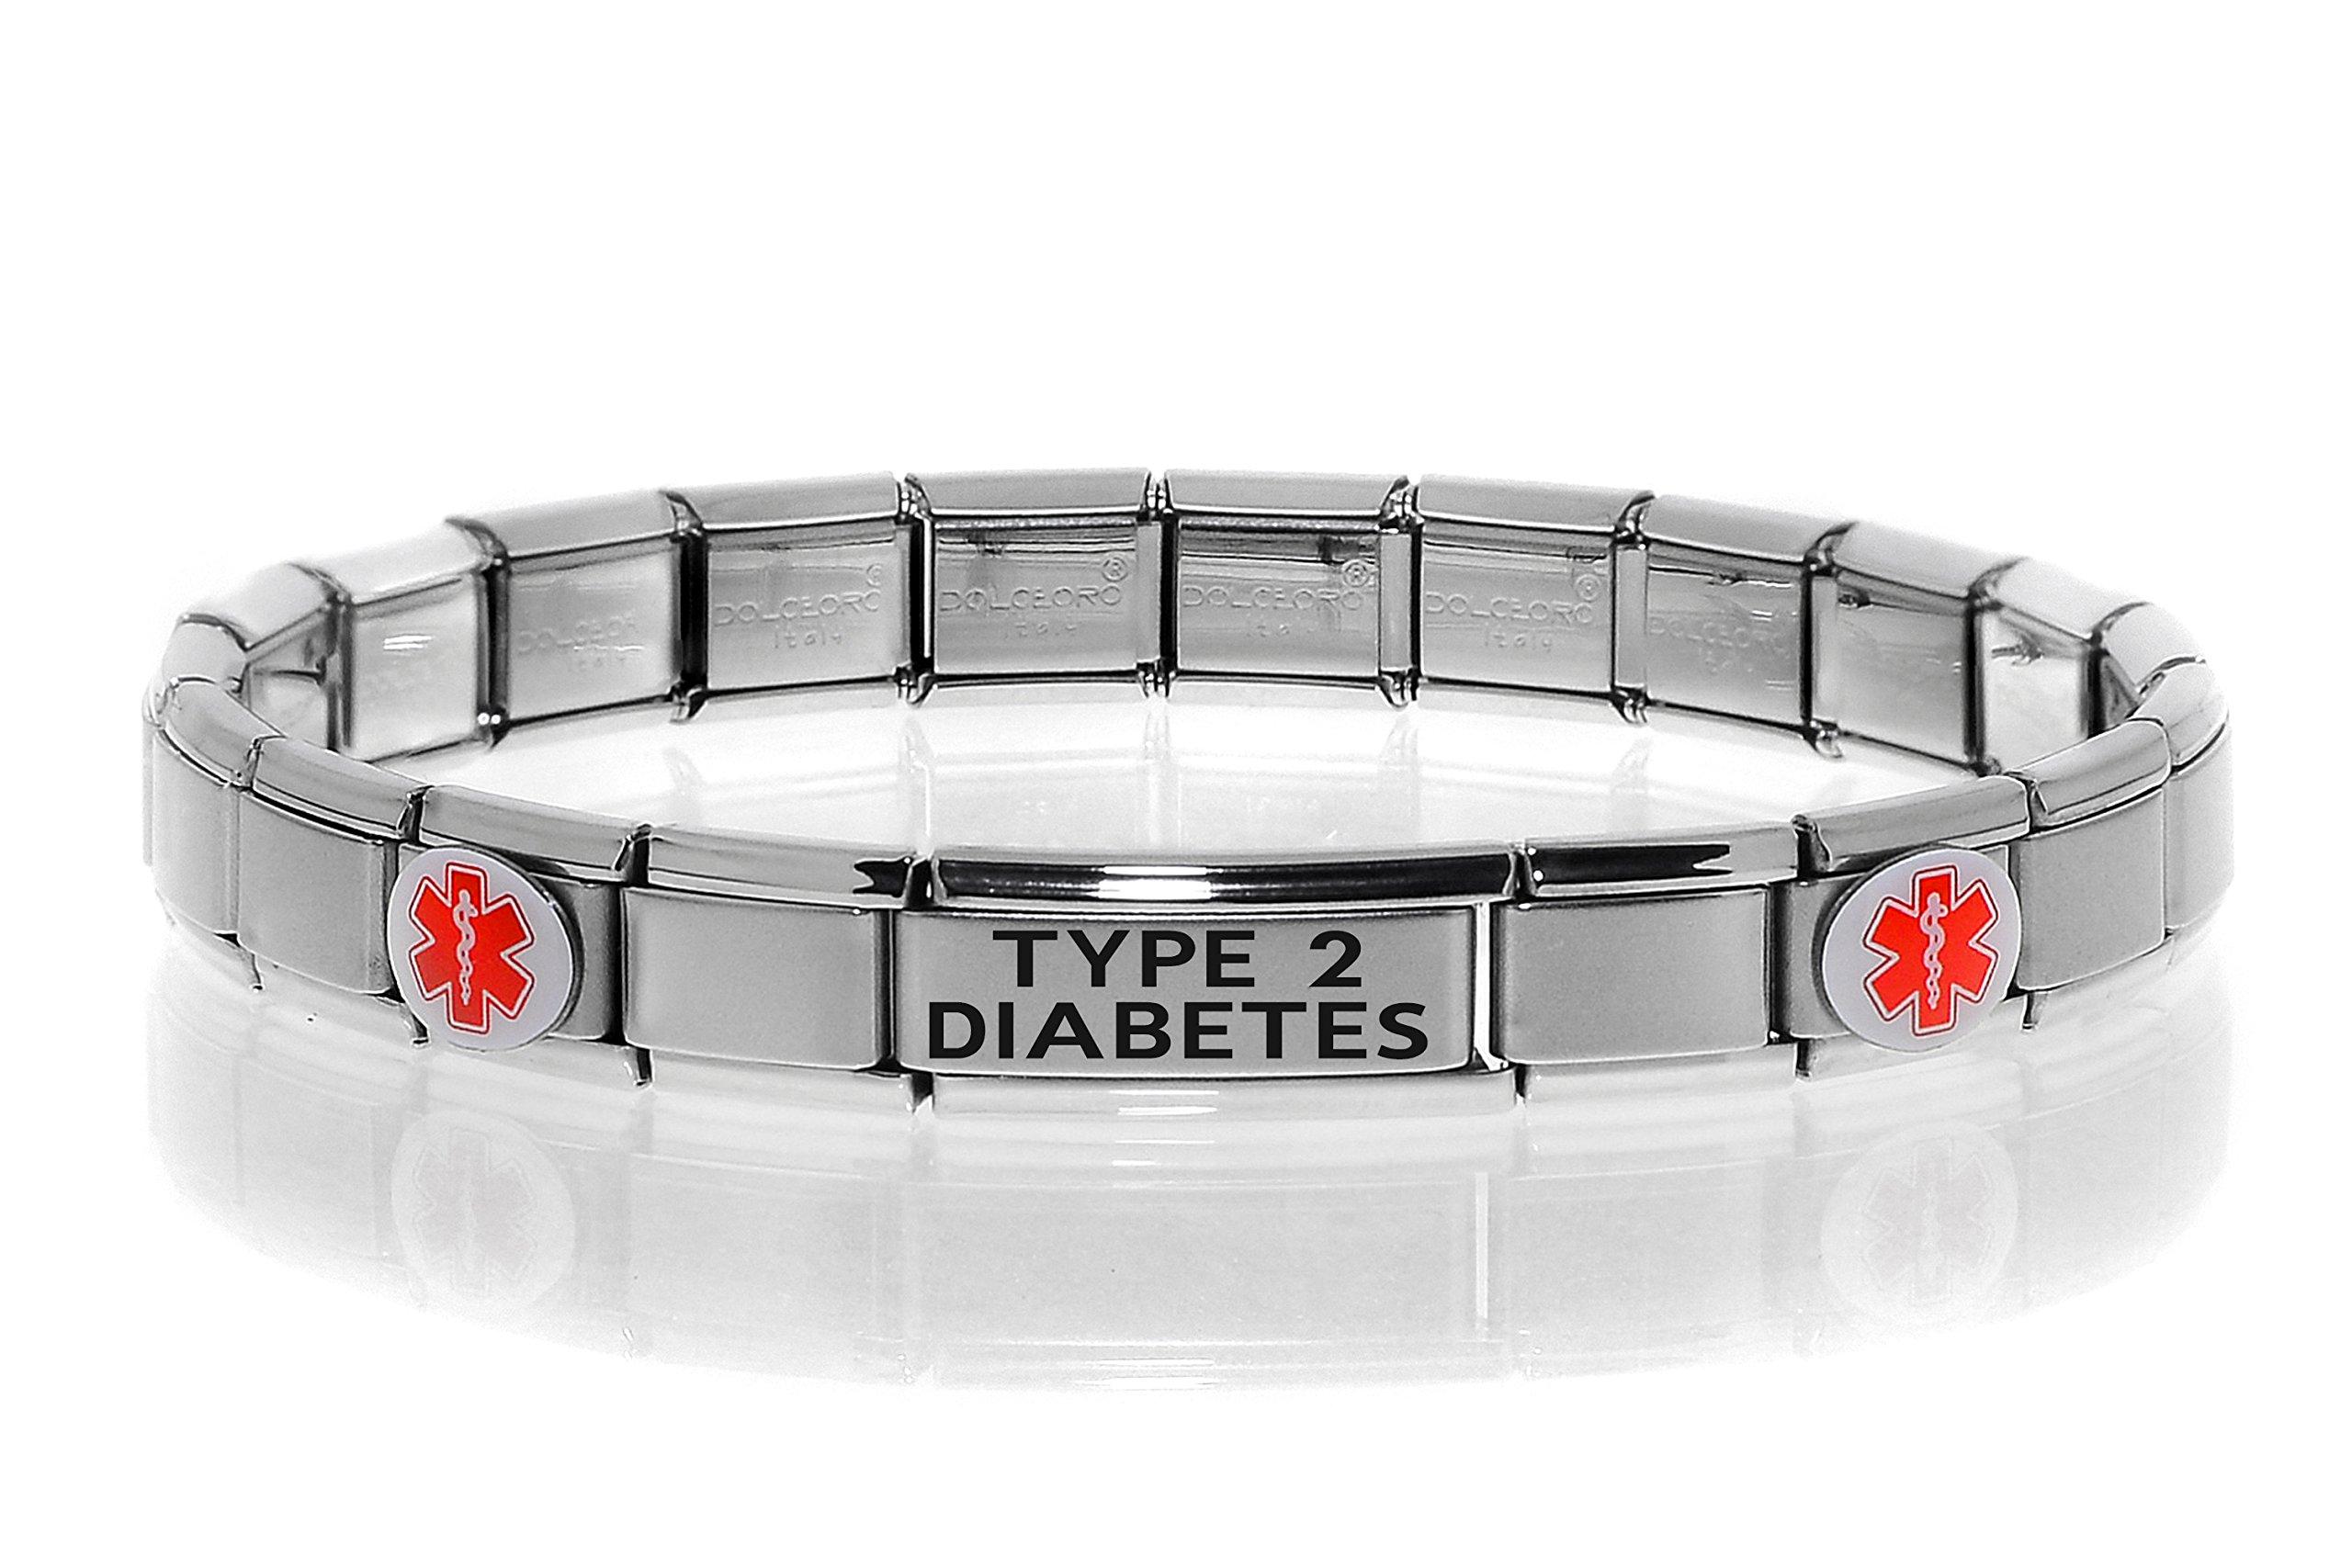 Dolceoro Type 2 Diabetes Medical Alert Bracelet - Stainless Steel Stretchable Italian Style Modular Charm Links